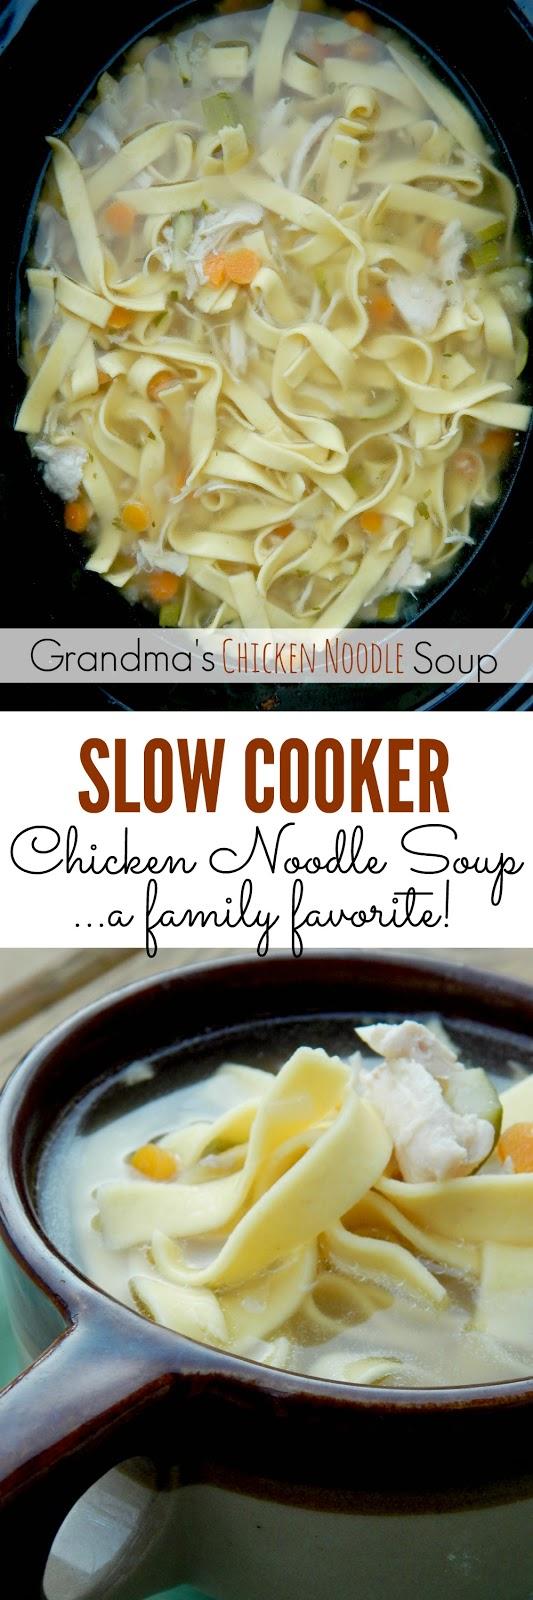 grandma's slow cooker chicken noodle soup (sweetandsavoryfood.com)